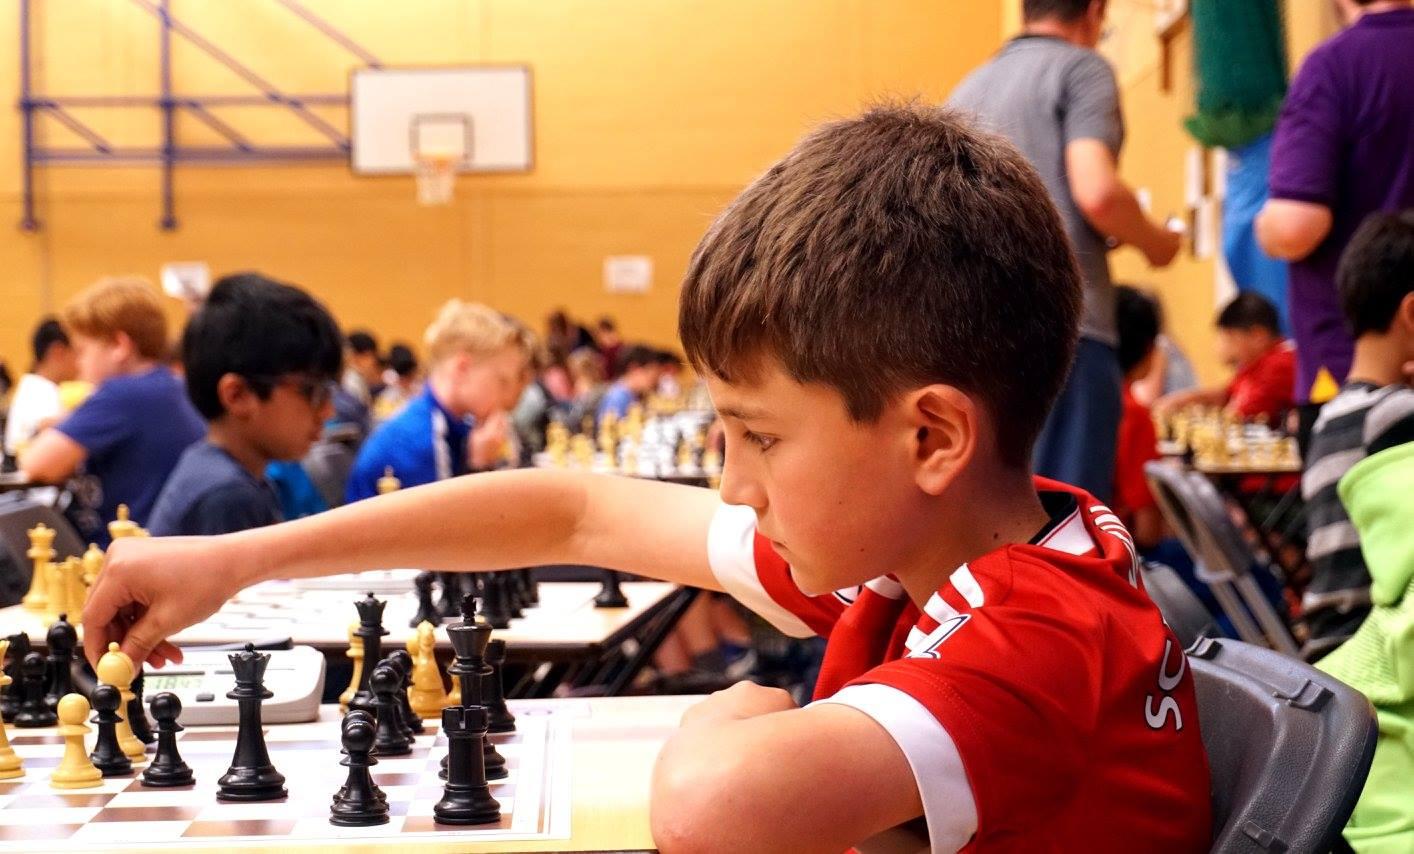 British chess championship 2018 prizes for kids